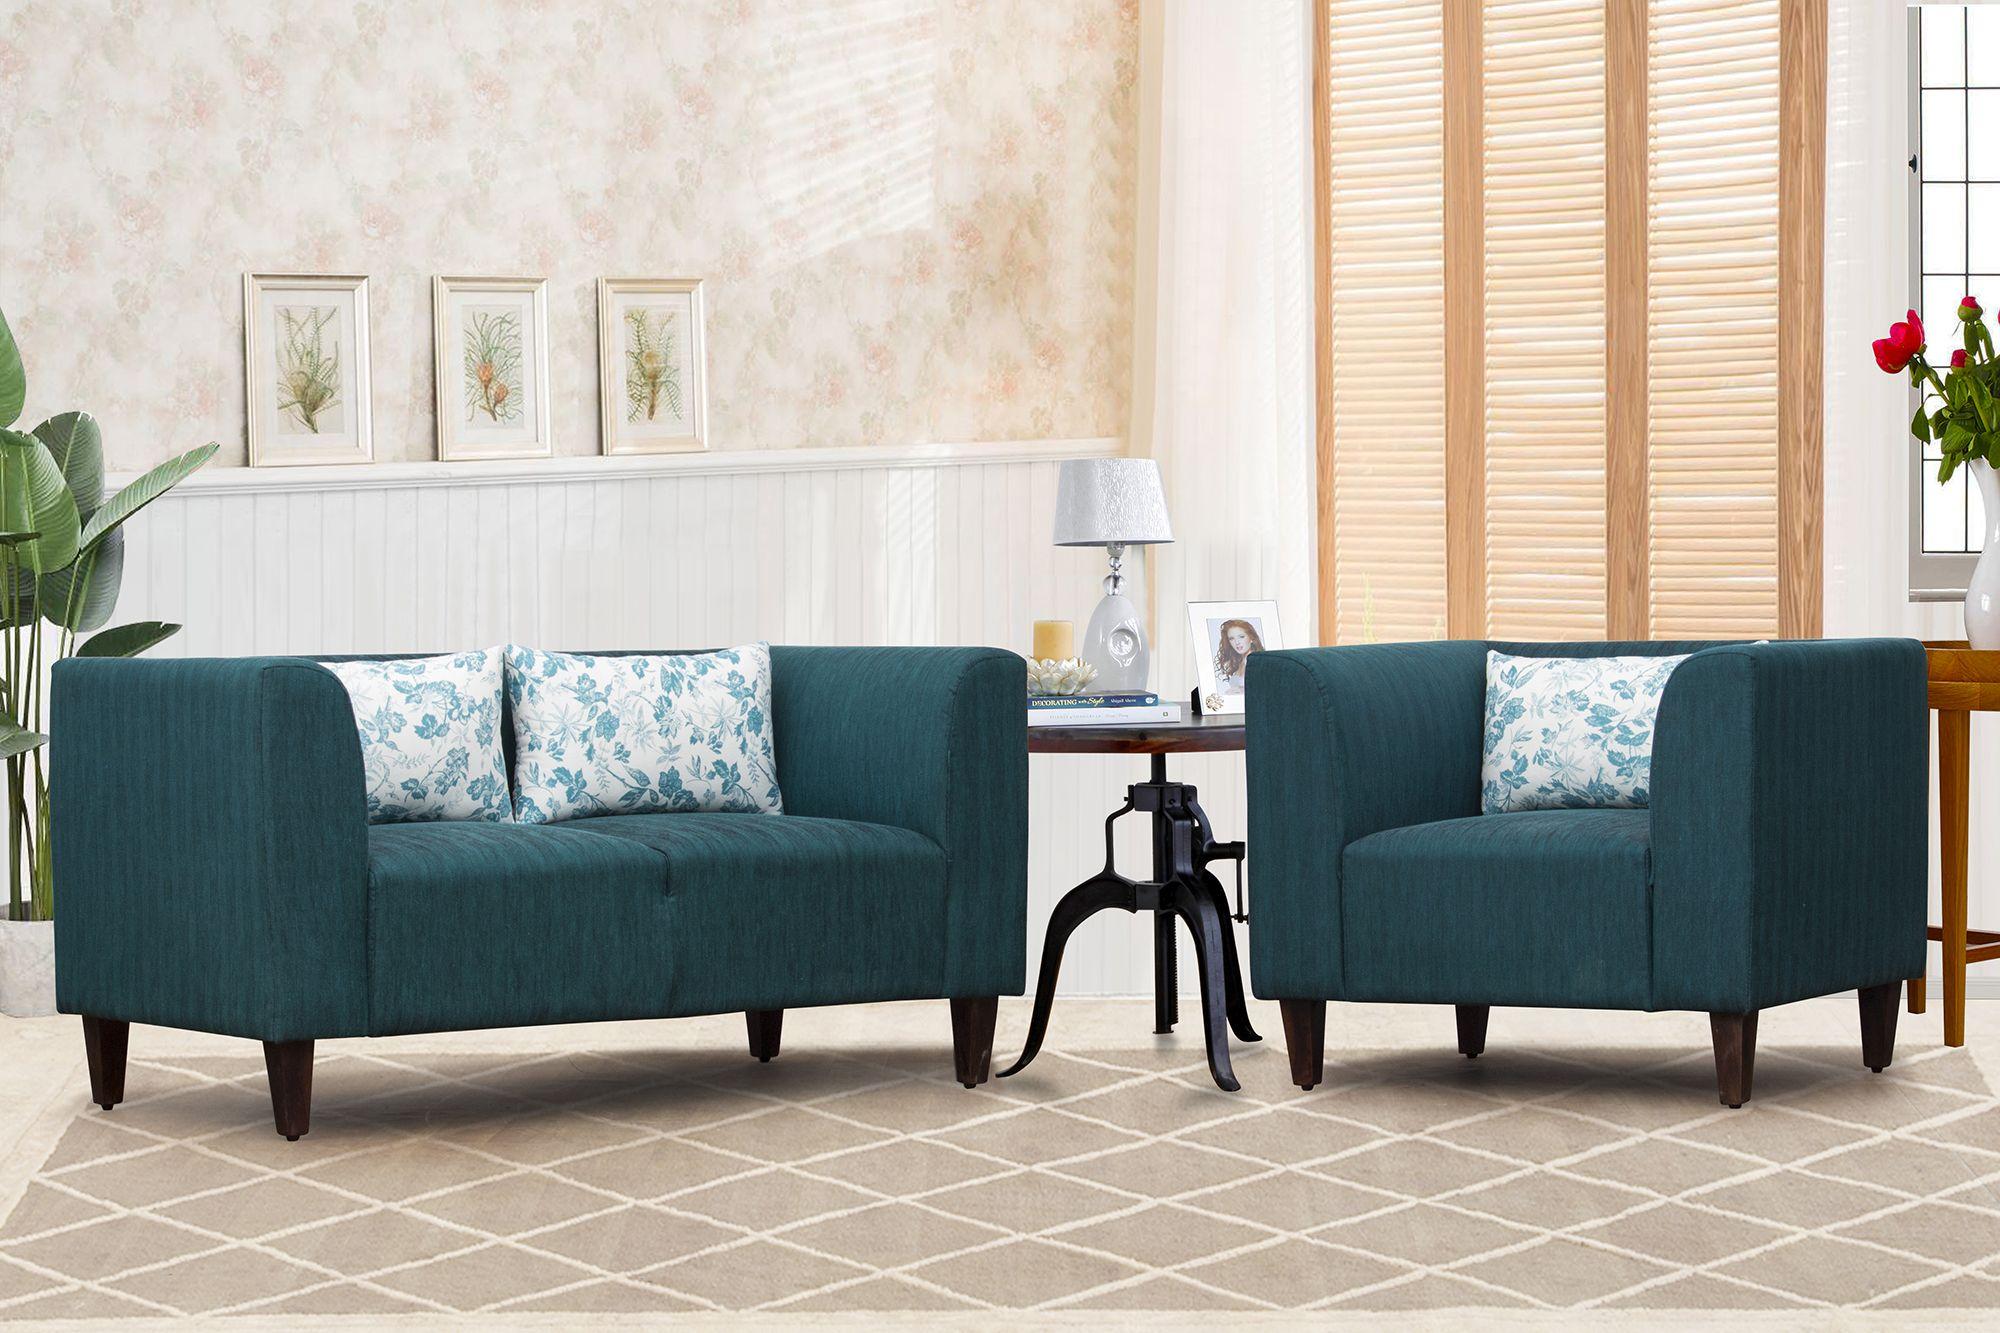 Awesome Harvey 2 1 Green Fabric Sofa Set The Harvey Sofa Set By Machost Co Dining Chair Design Ideas Machostcouk